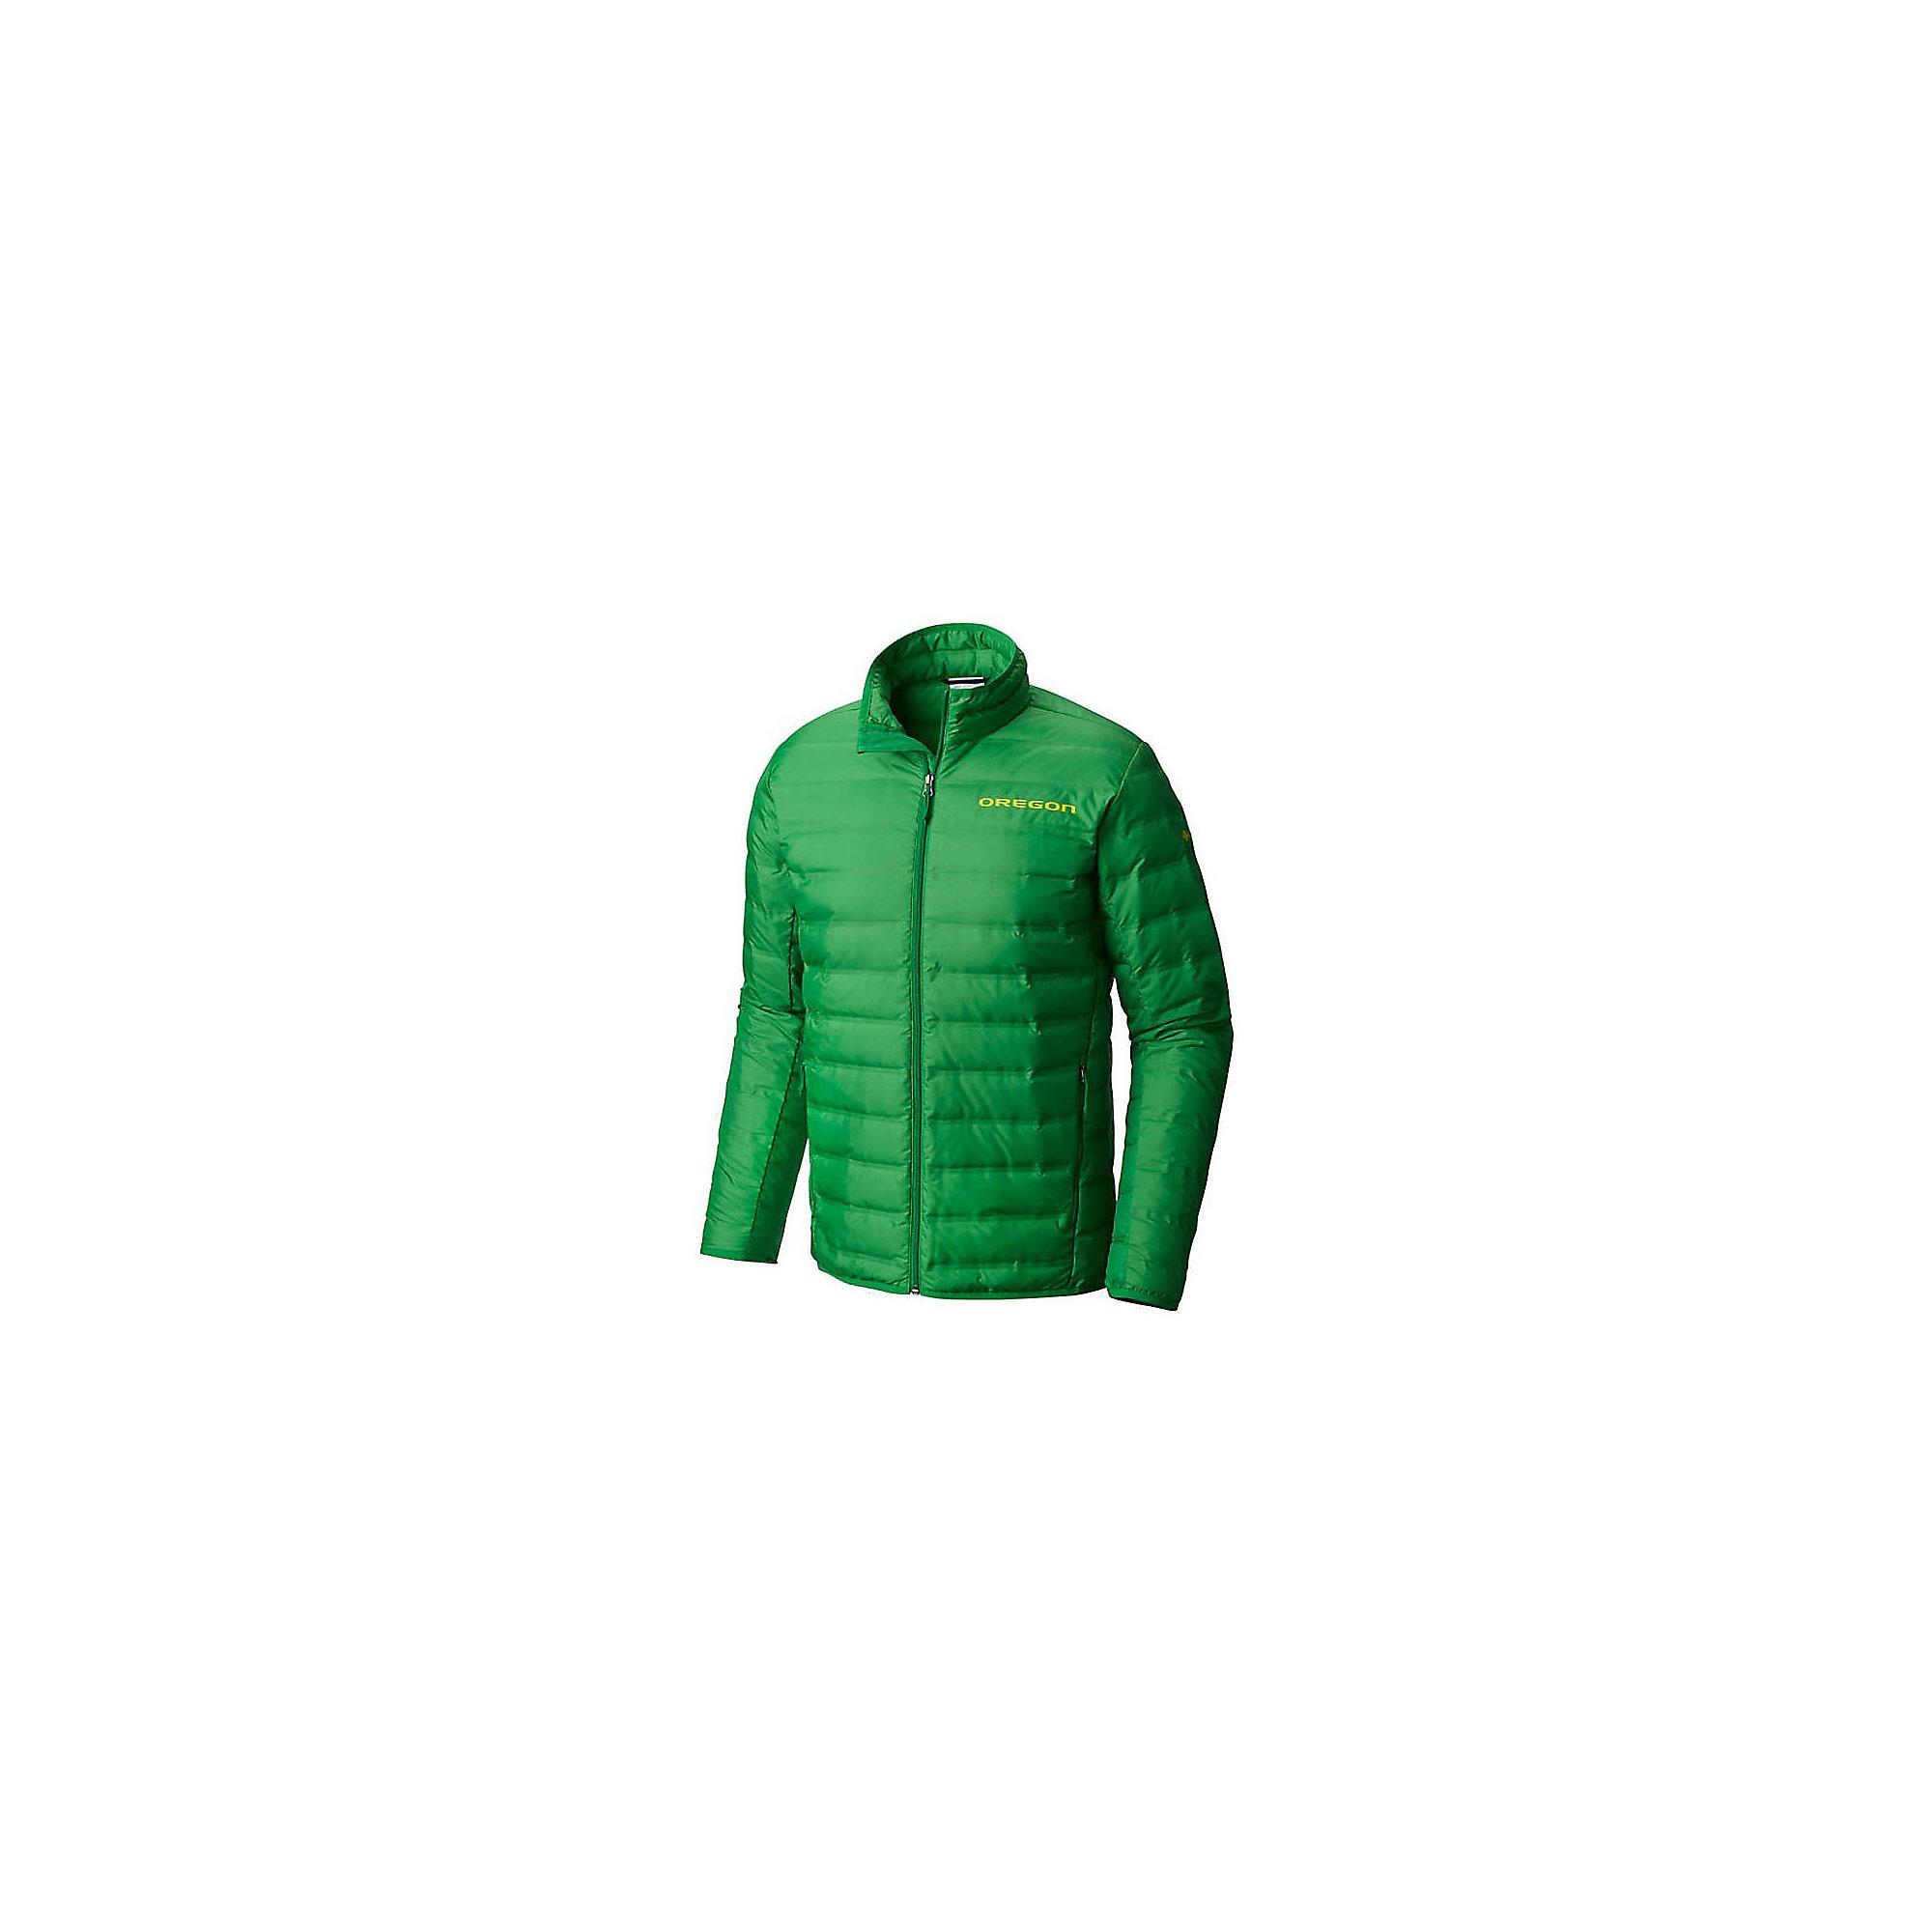 8ef957cb Columbia Collegiate Lake 22 Jacket in Green for Men - Lyst